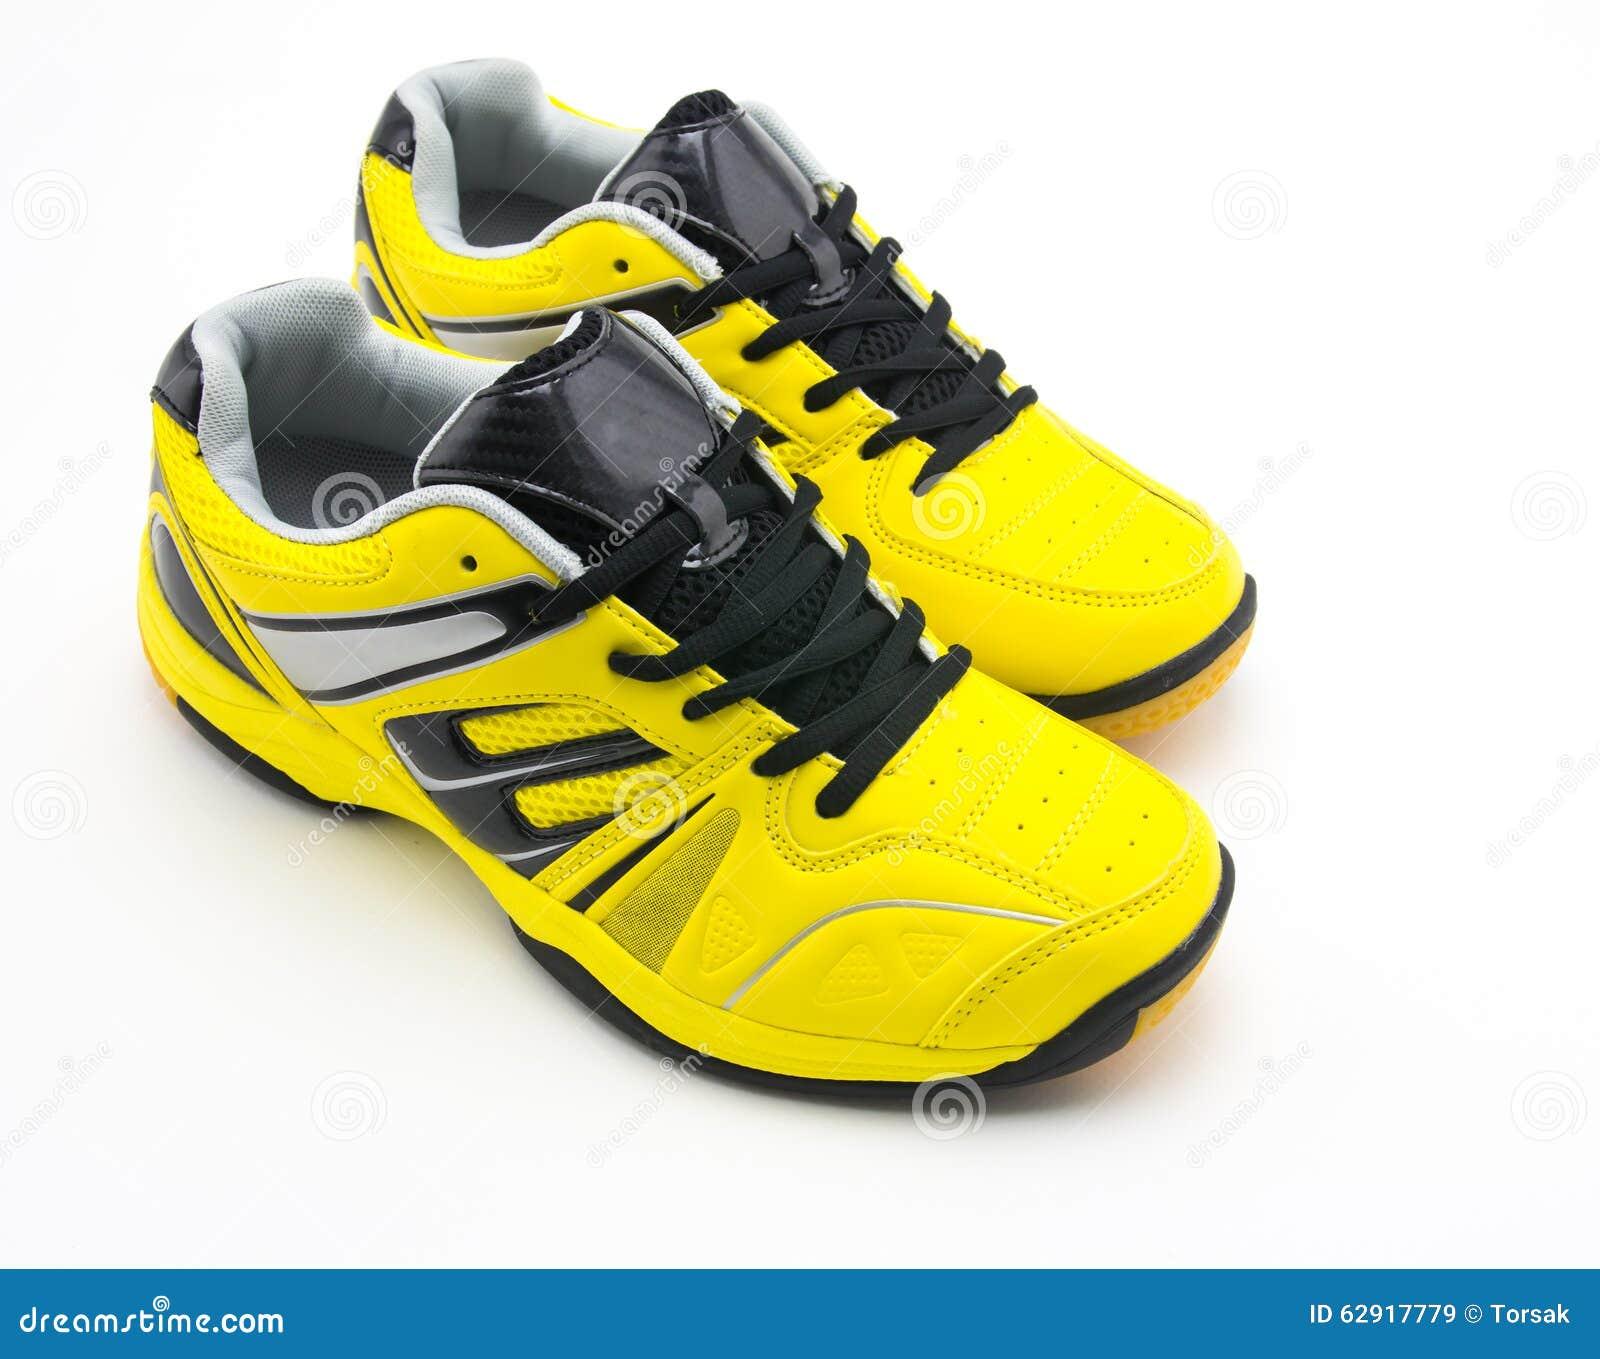 636cbab99e6 Κίτρινα αθλητικά παπούτσια στοκ εικόνα. εικόνα από trendy - 62917779